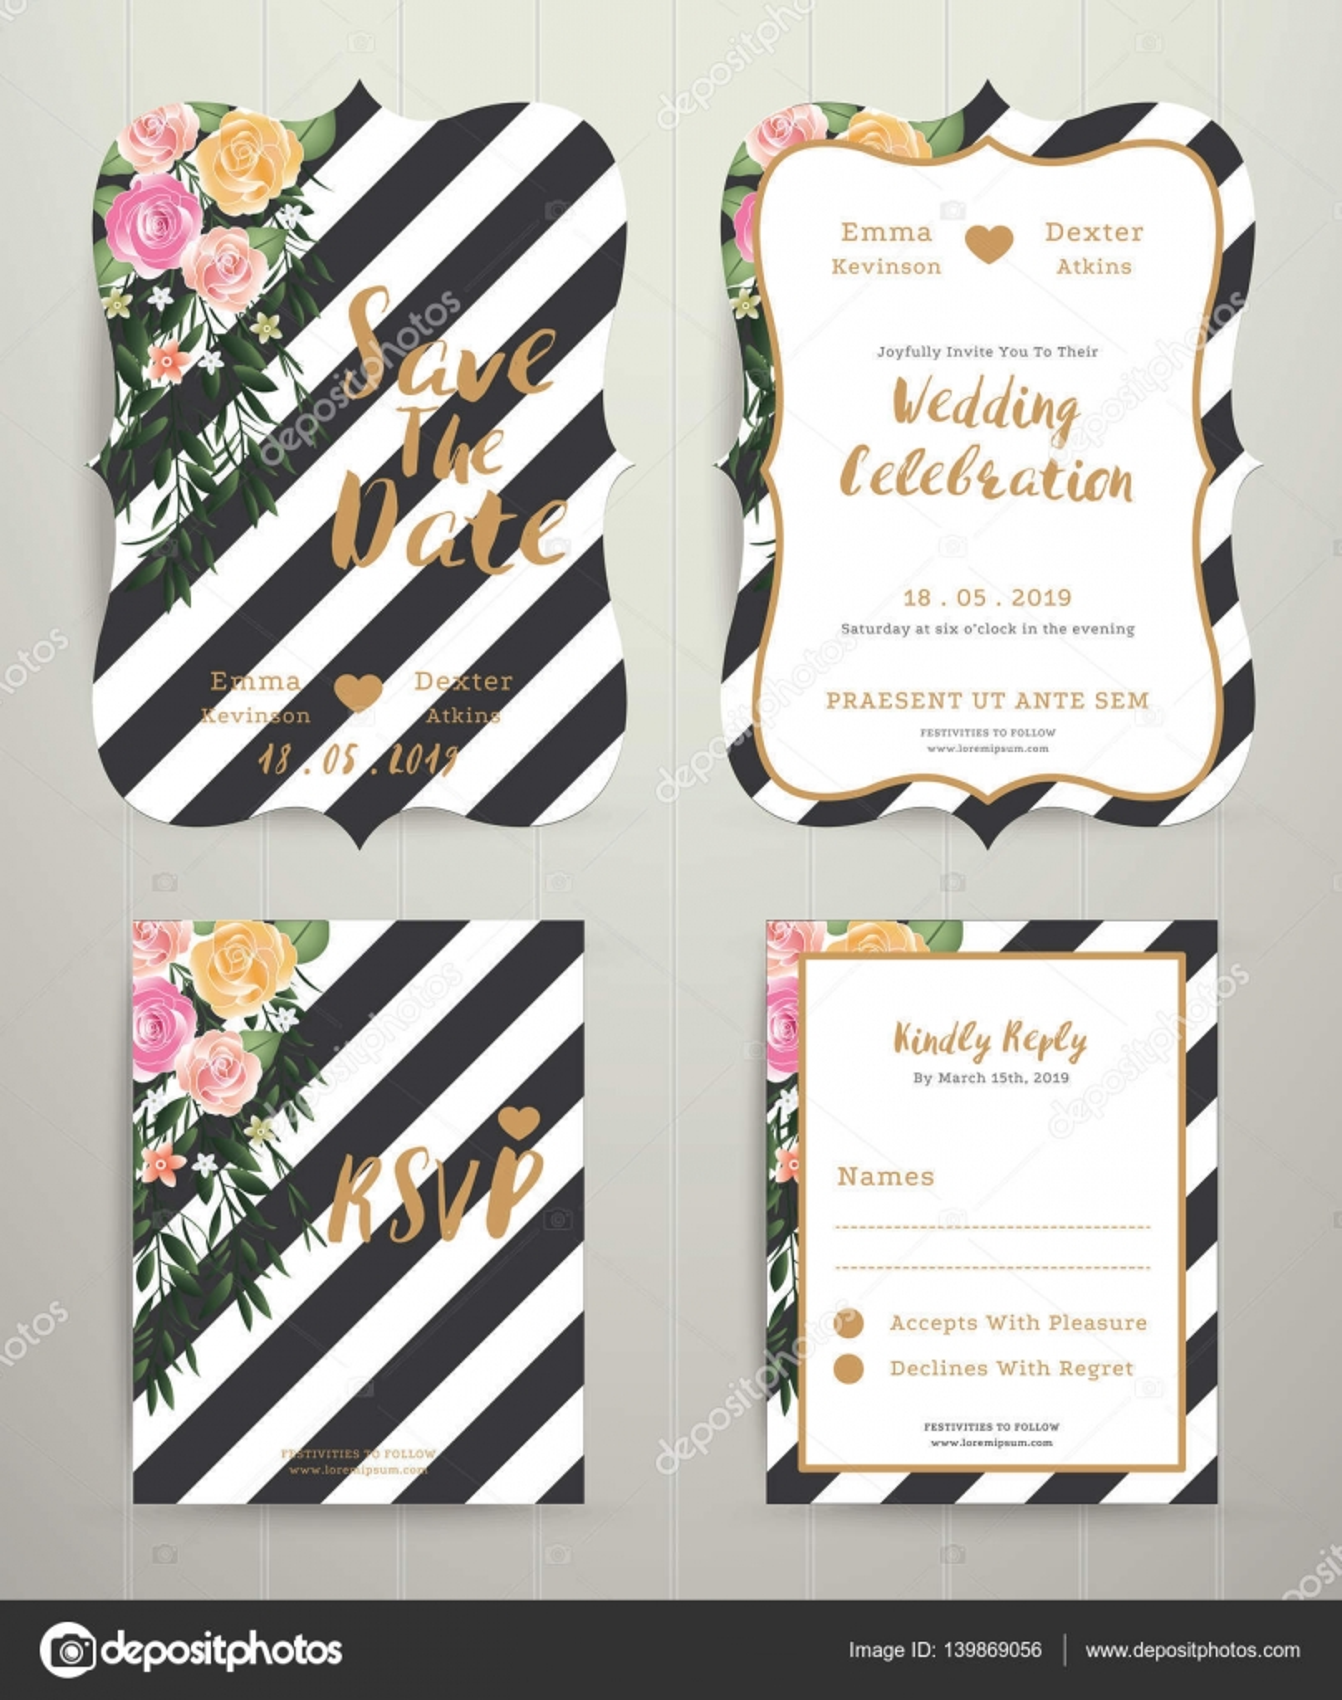 Modern wedding invitation card set on black and white stripe bac ...